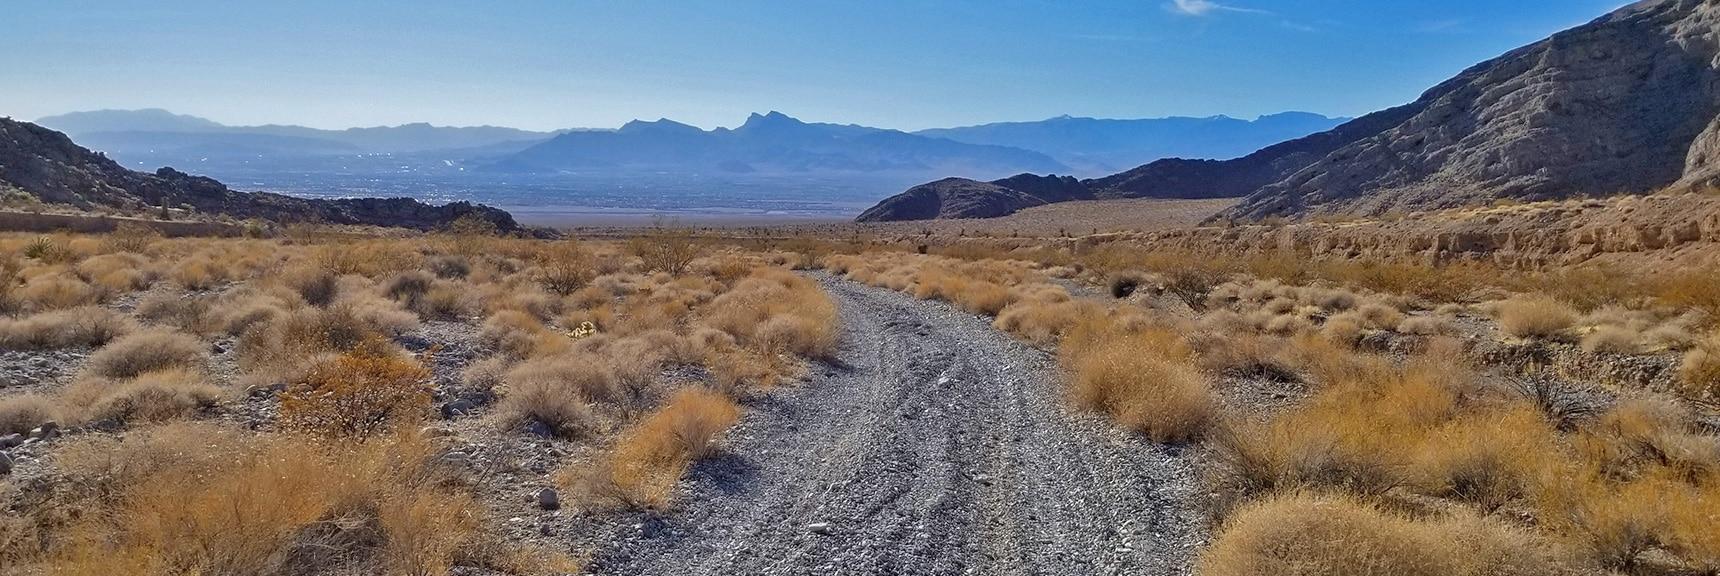 View Down Pass Into North Las Vegas. 3-6-Inch Deep Gravel Slows Mountain Bike to a Walk | Gass Peak Road Circuit | Desert National Wildlife Refuge | Nevada